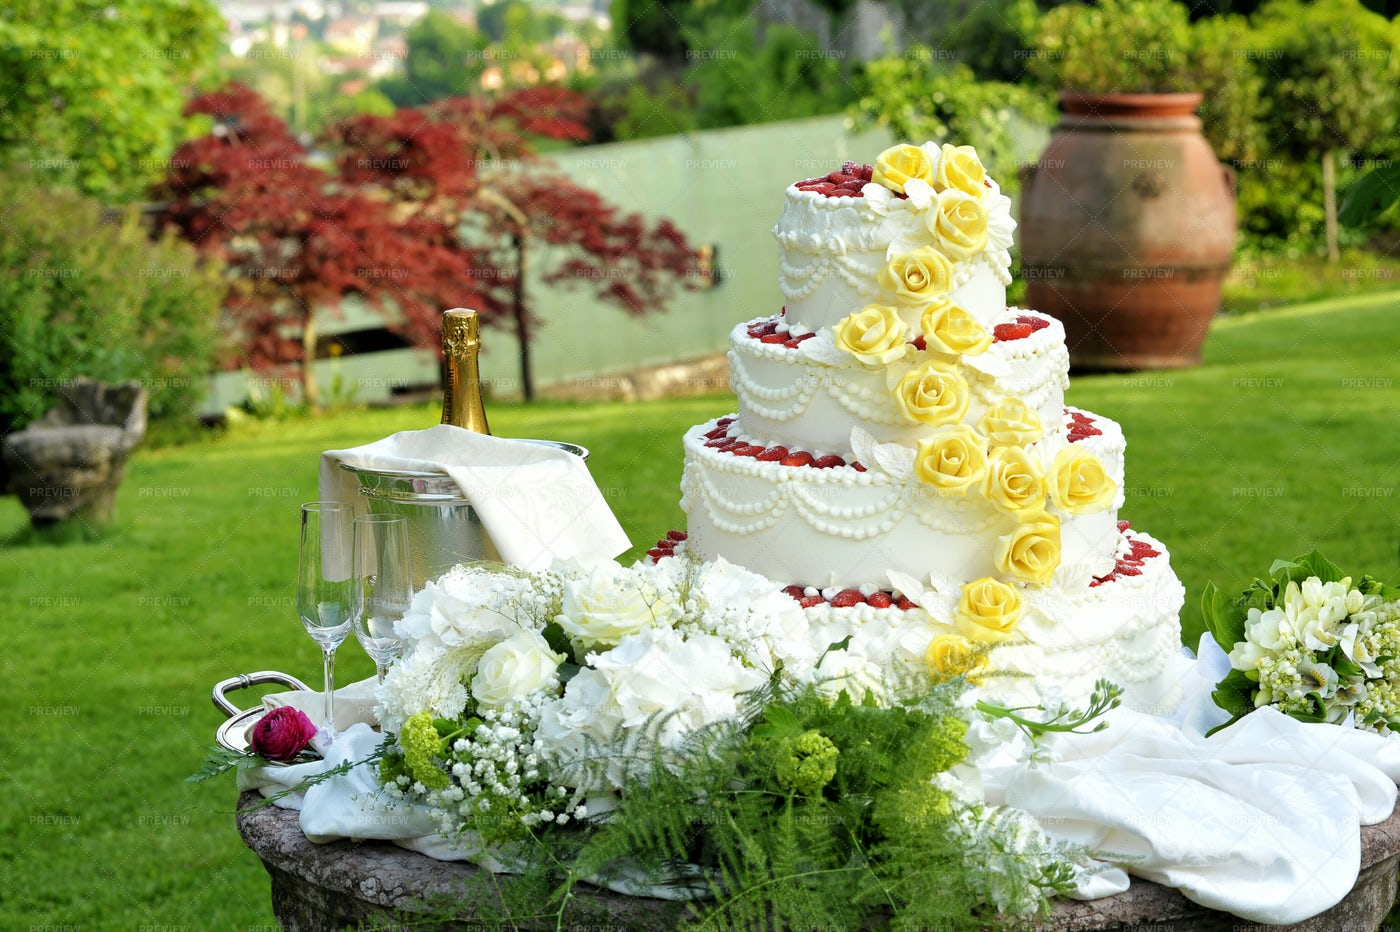 Decorative Wedding Cake: Stock Photos